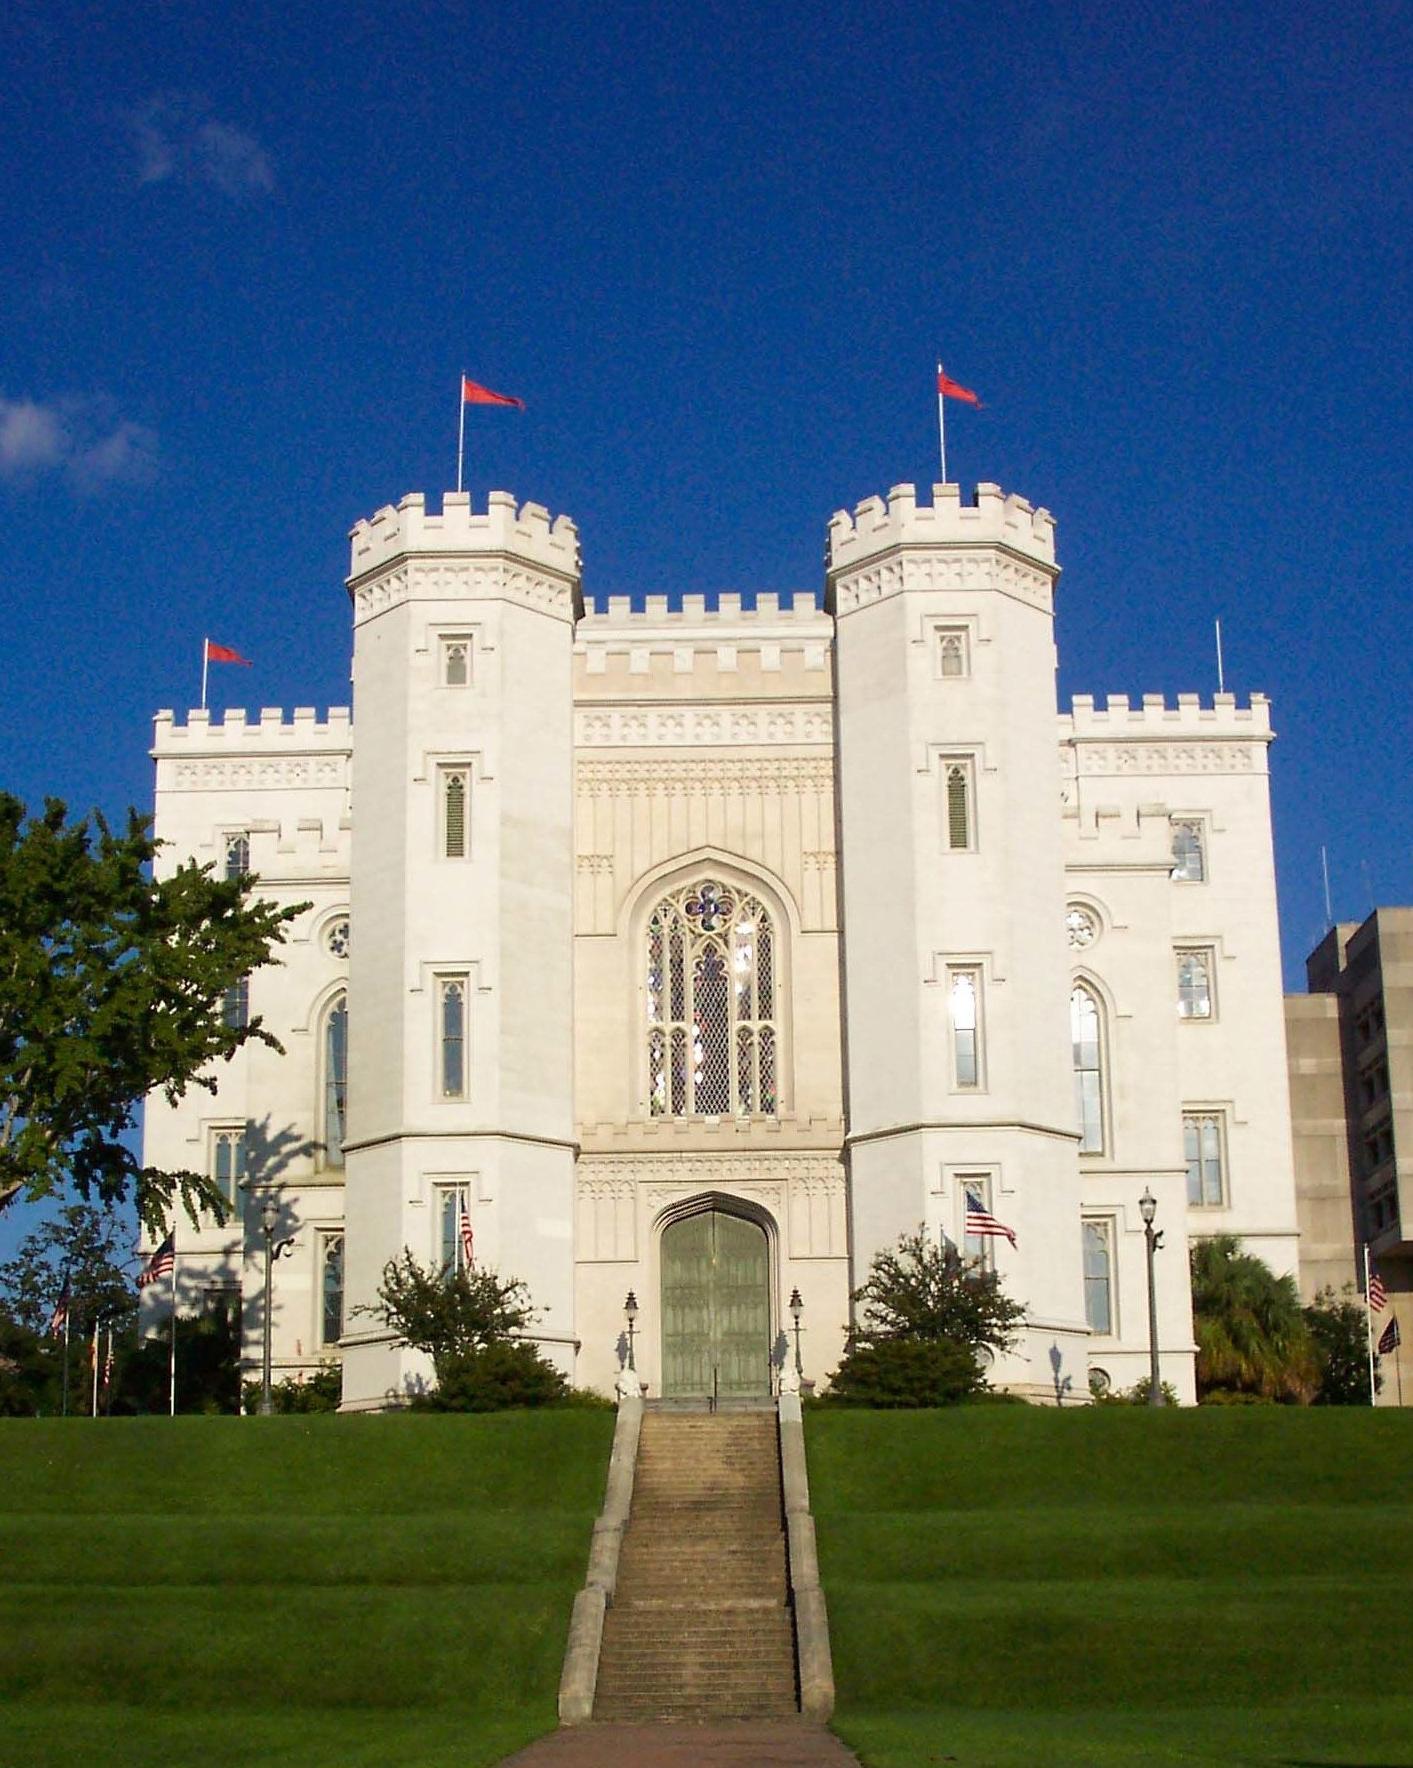 castle-wedding-venues-louisiana-old-state-capitol-baton-rouge-0115.jpg